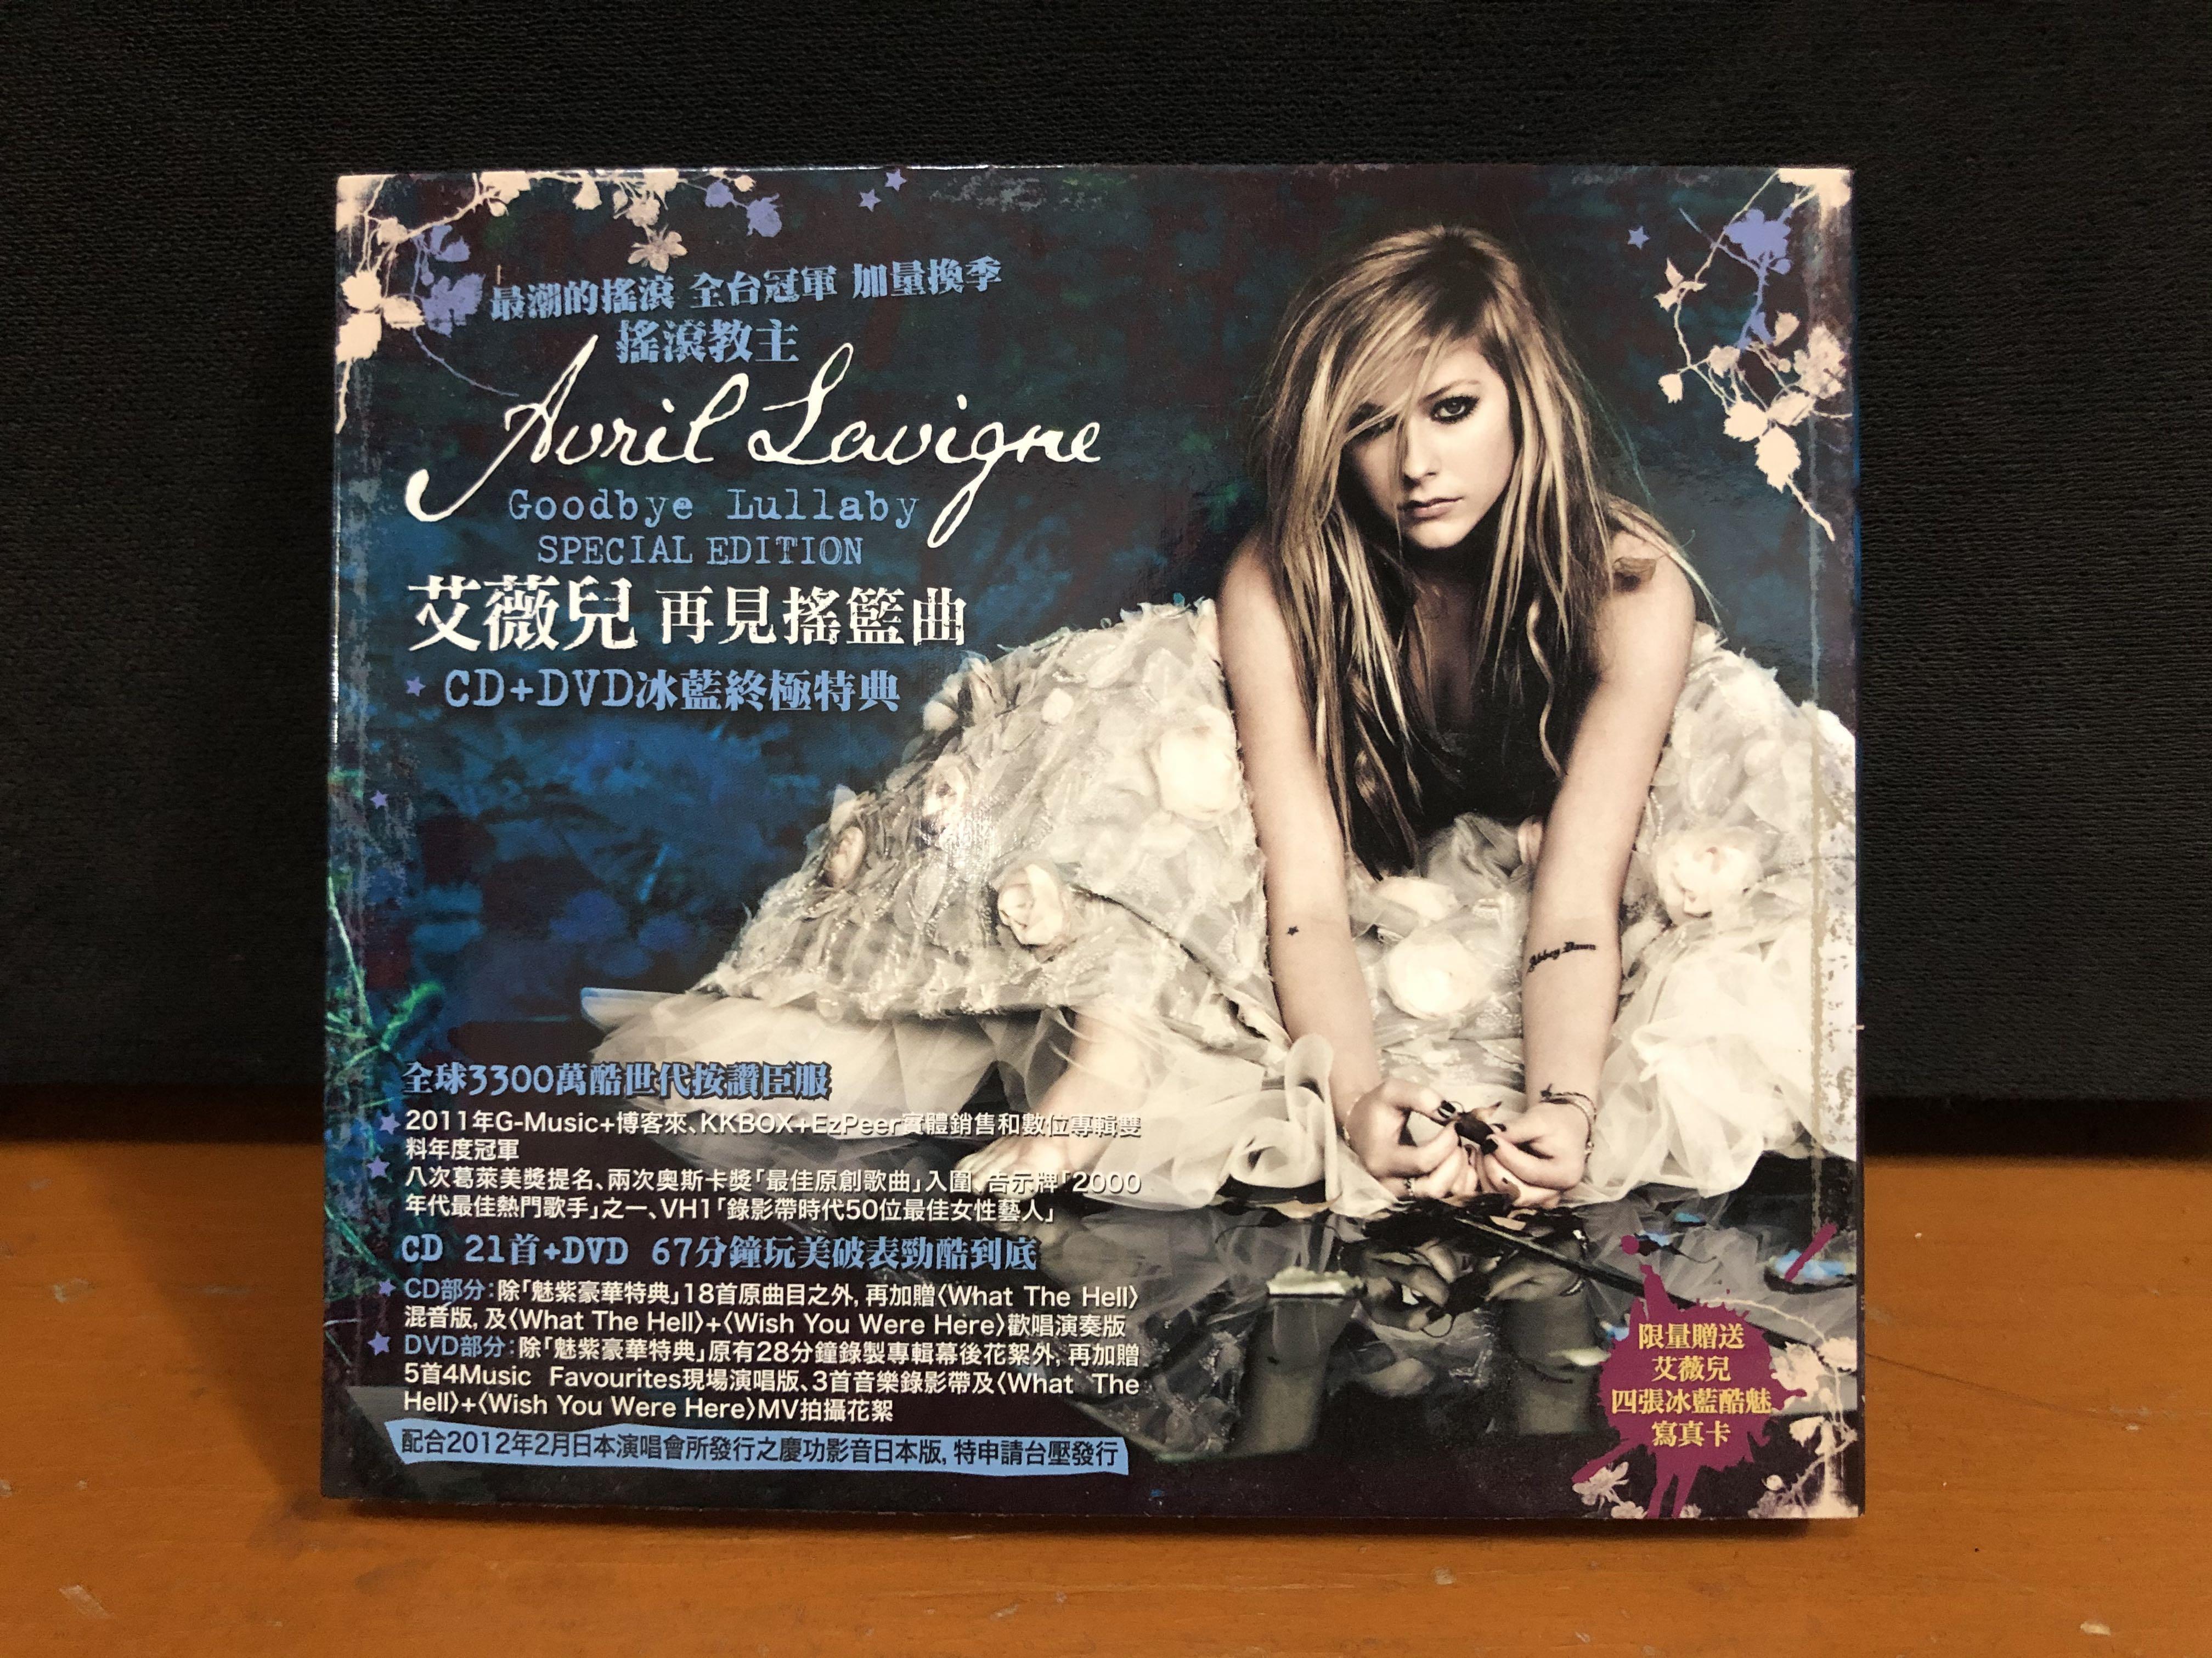 Avril Lavigne / Goodbye Lullaby Special Edition (CD+DVD) 艾薇兒 / 再見搖籃曲 (CD+DVD) 冰藍終極特典